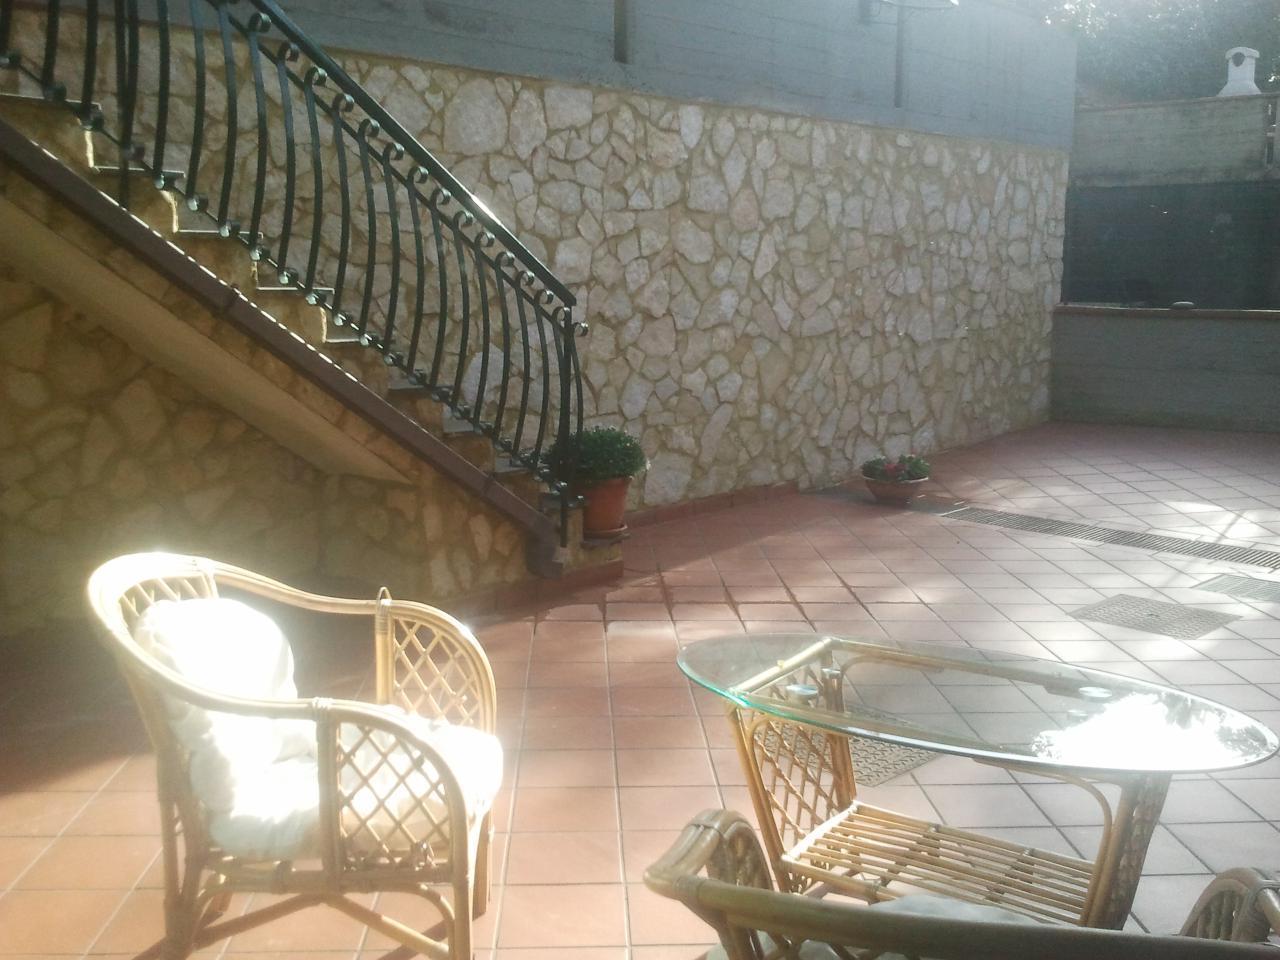 Appartement de vacances ZUHAUSE VON EMILIA - zwischen Ätna und Taormina (1743739), Aci Sant'Antonio, Catania, Sicile, Italie, image 8